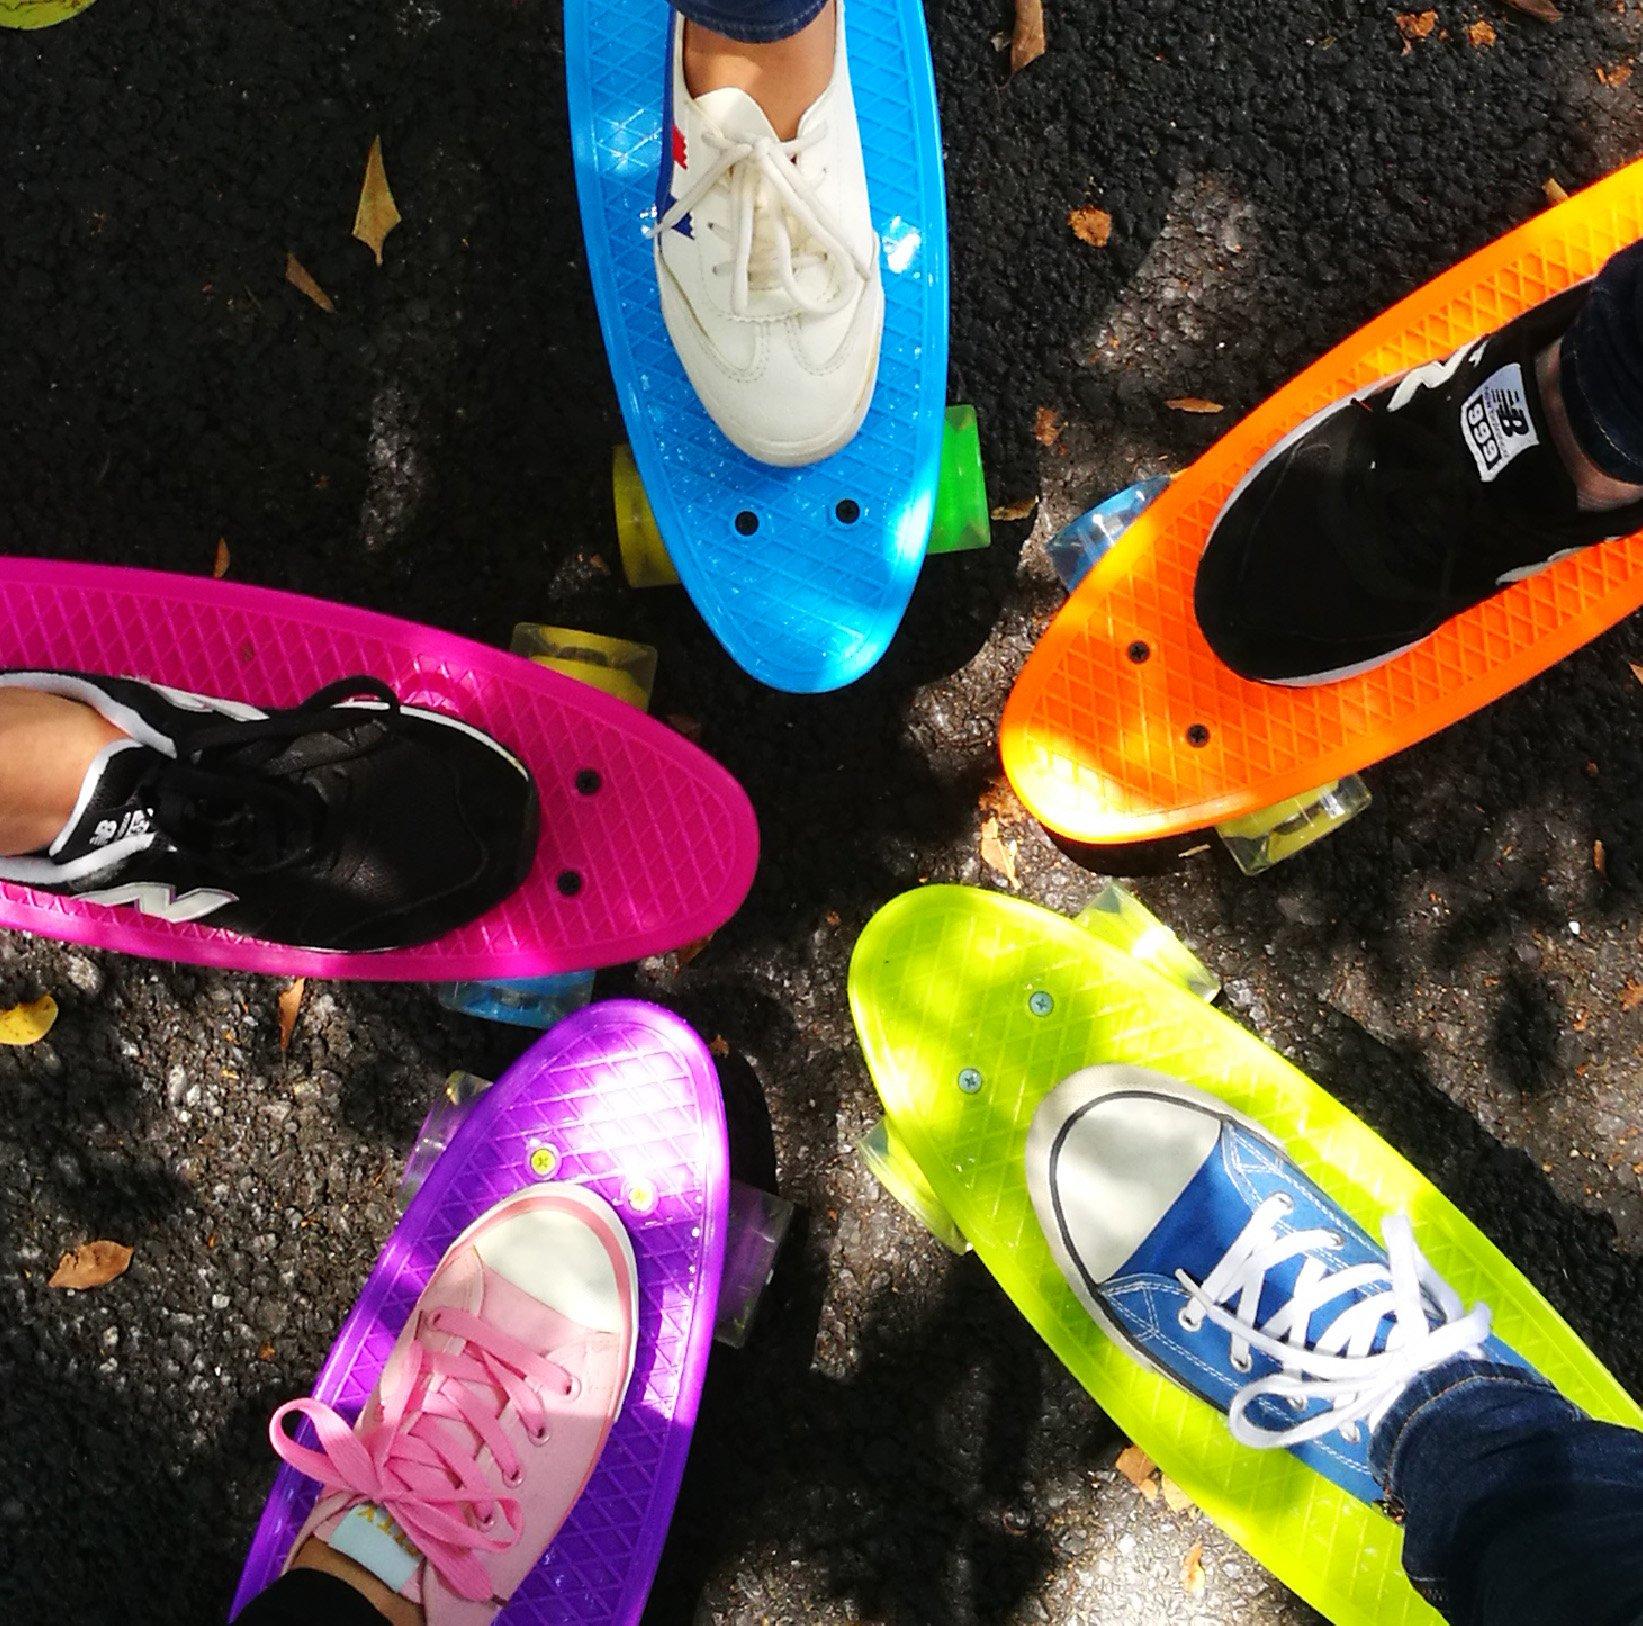 Merkapa 22'' Complete Skateboard with Colorful LED Light Up Wheels for Beginners (Orange)